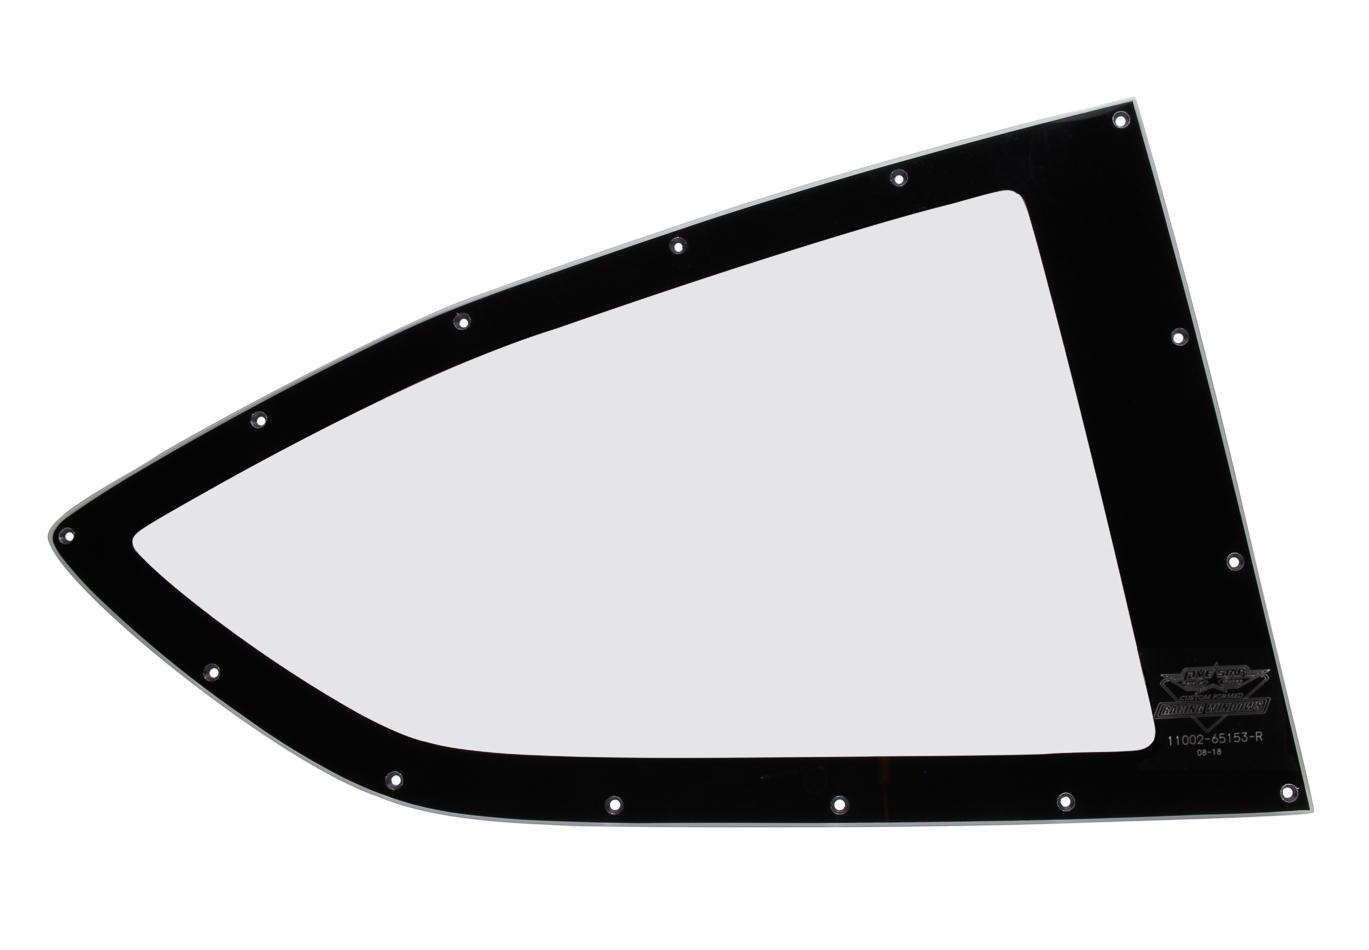 Fivestar 2019 LM Qtr Window Right Cut Drilled W/Blackout